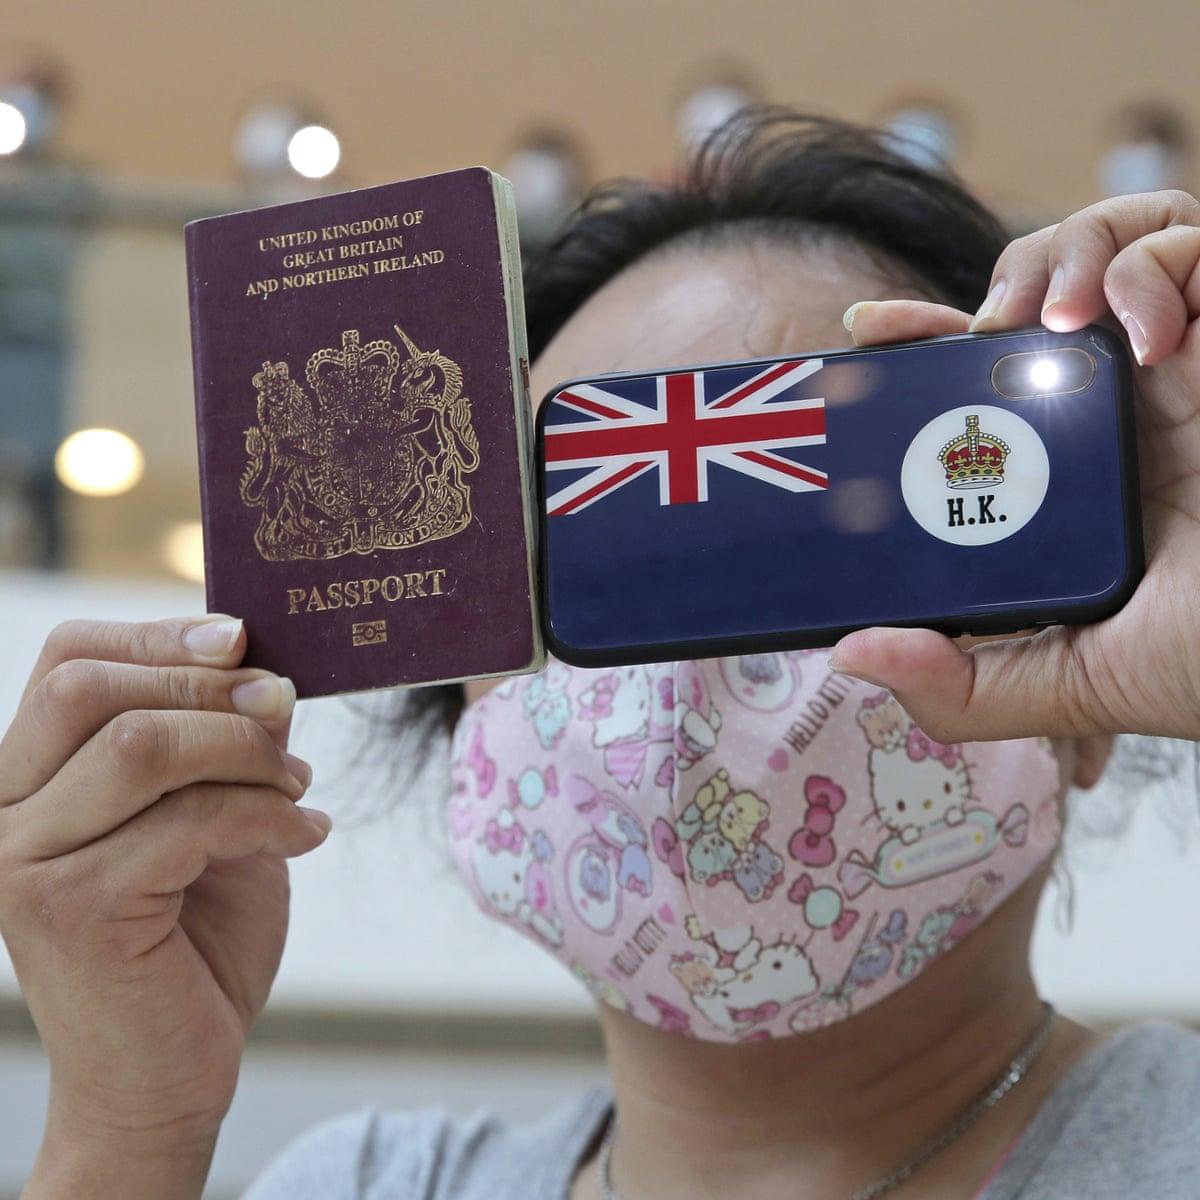 Britain launches new visa for millions of Hongkongers fleeing China's crackdown | Hong Kong | The Guardian